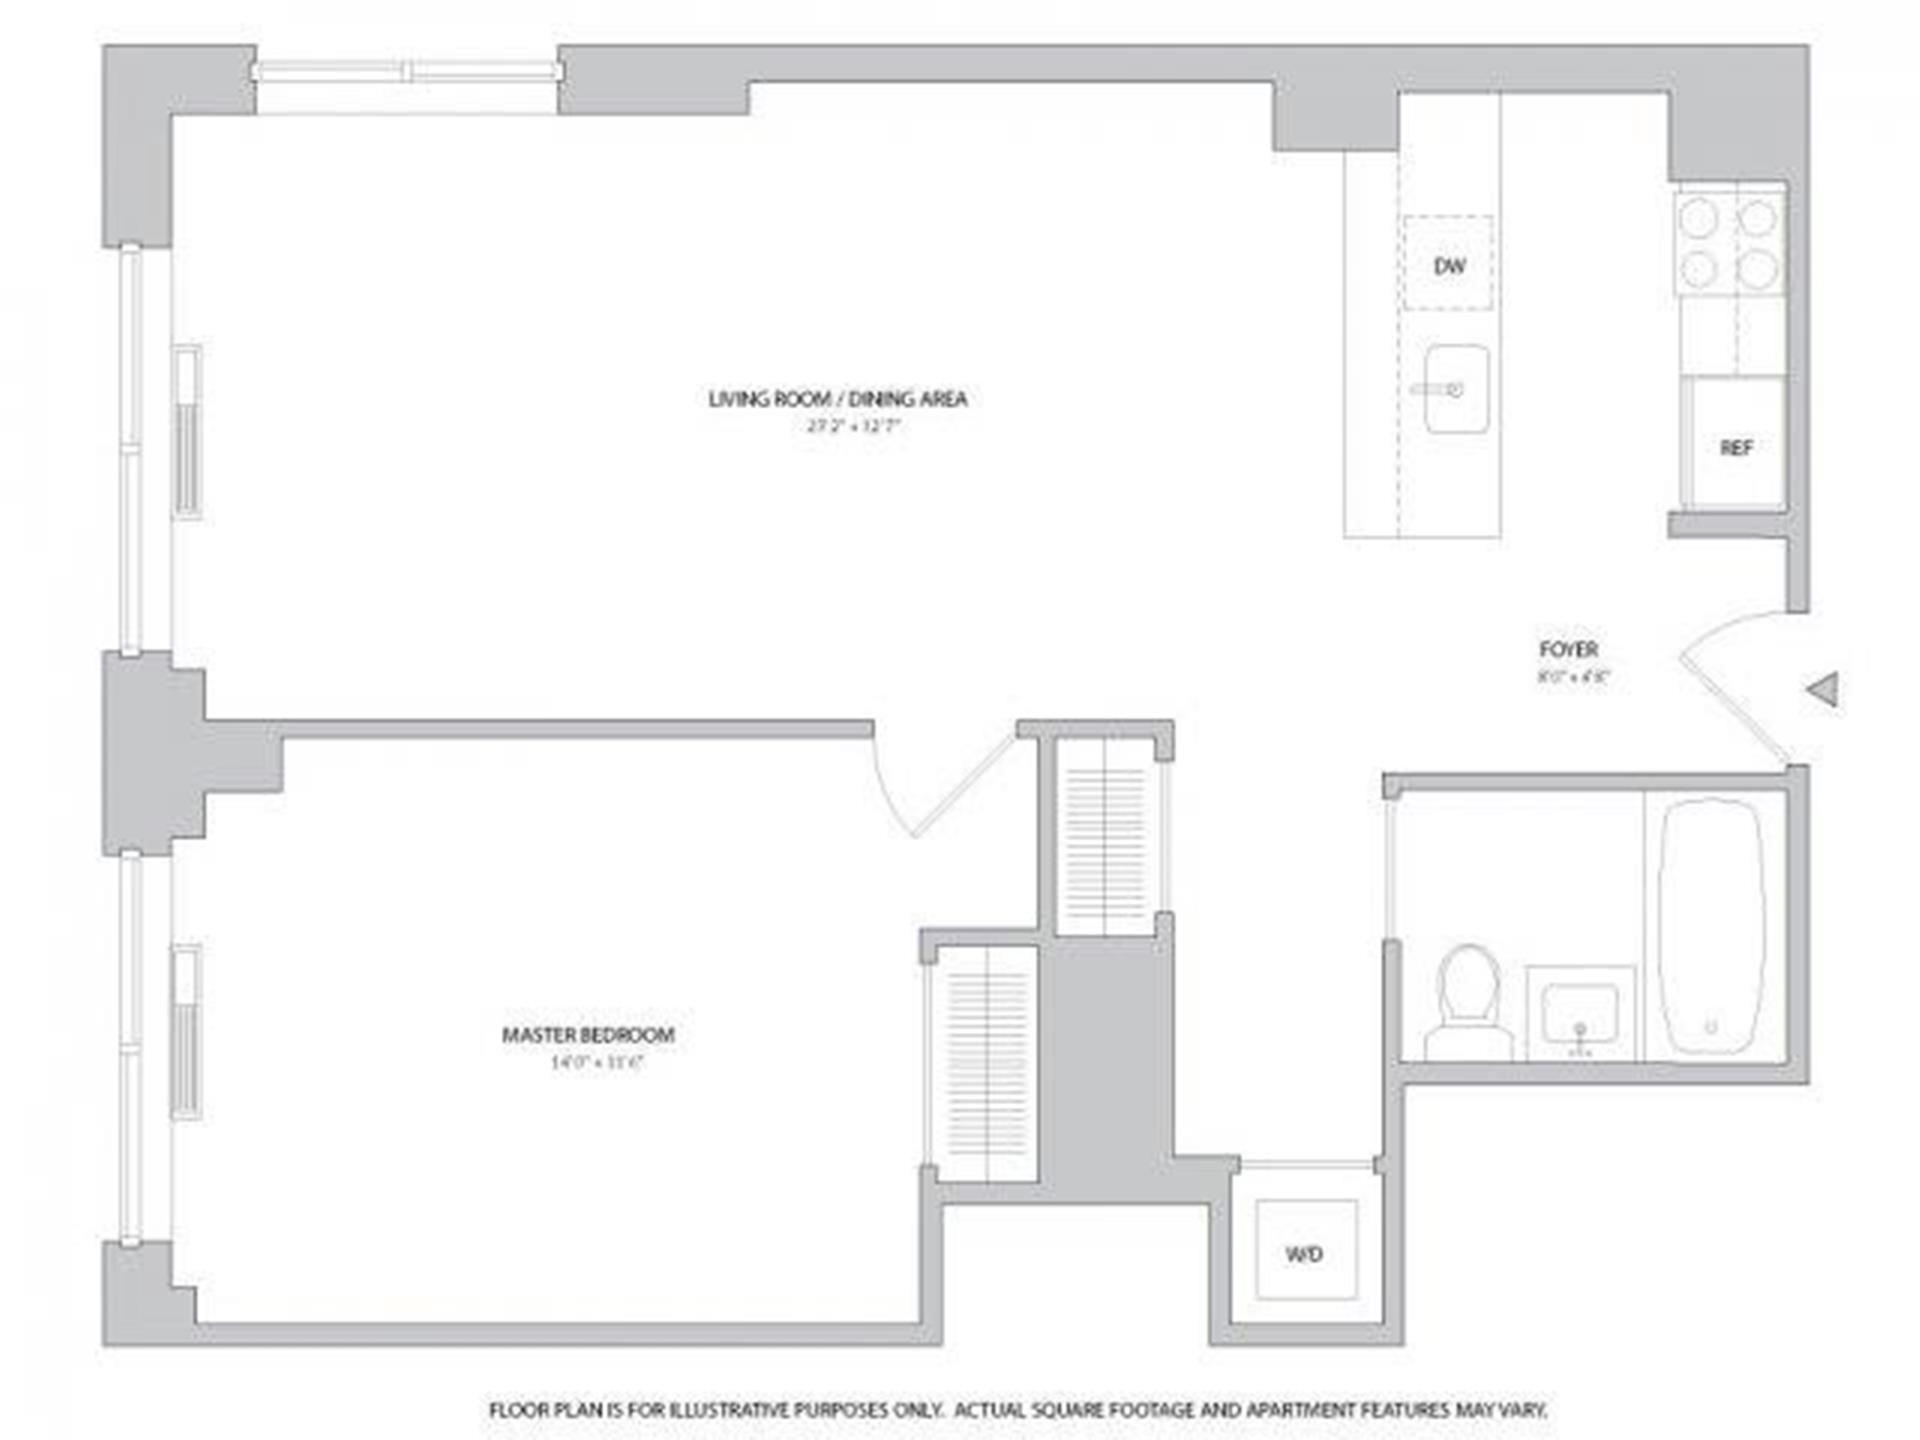 Floor plan of 400 West 63rd St, 805 - Upper West Side, New York